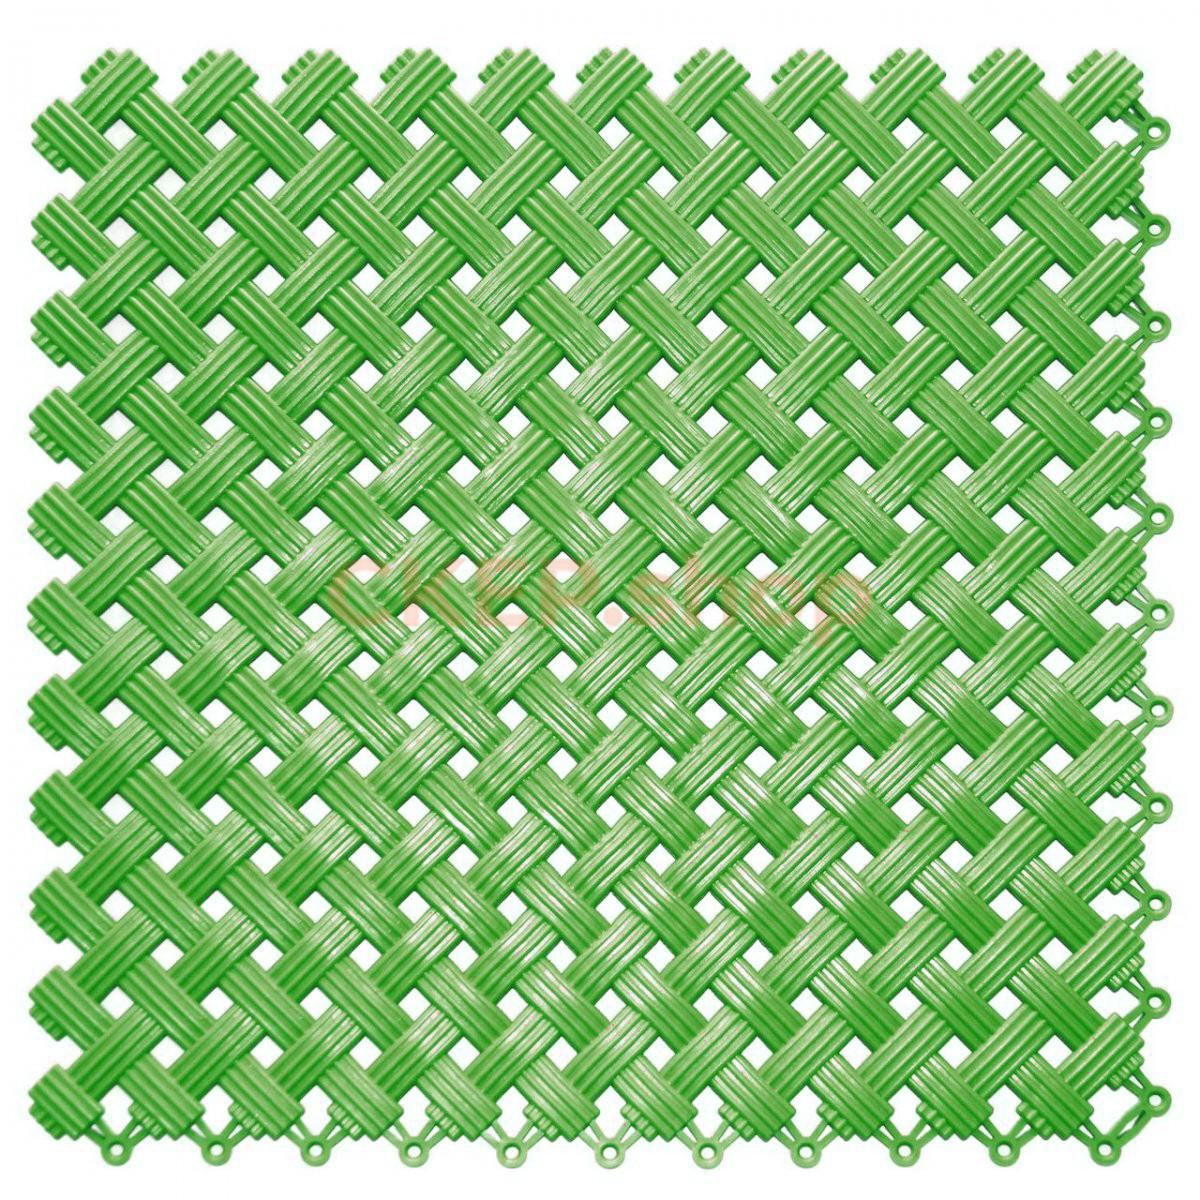 Покрытие модульное Аква, 340х340х9 мм, зеленое